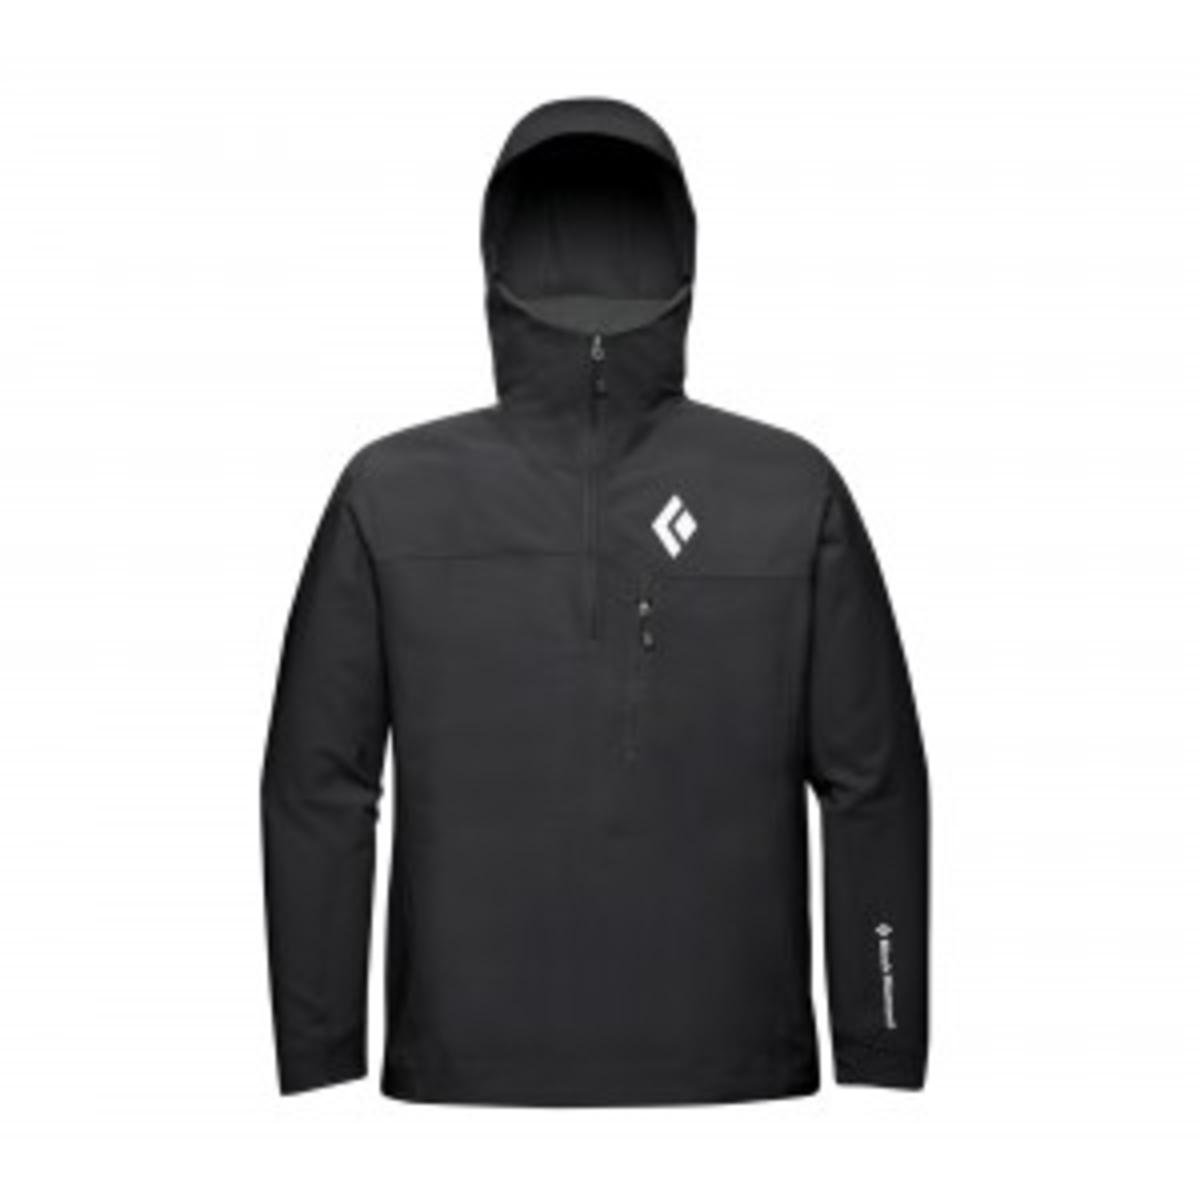 Black diamond stack jacket